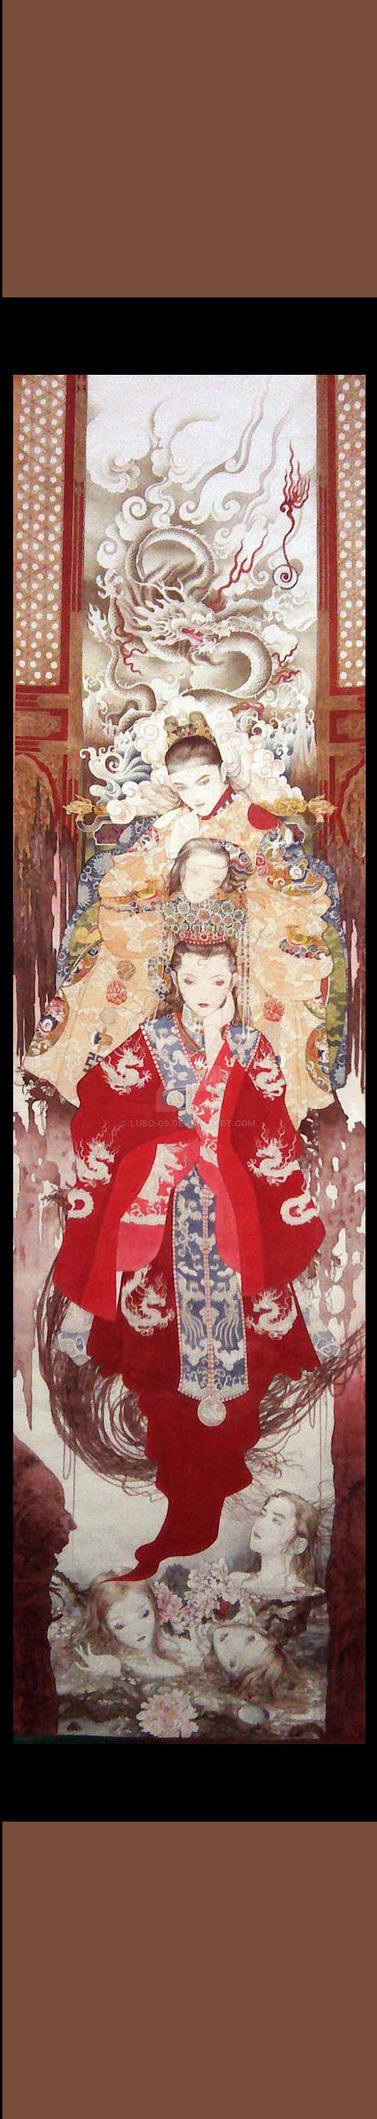 Ming dynasty by lubo-09